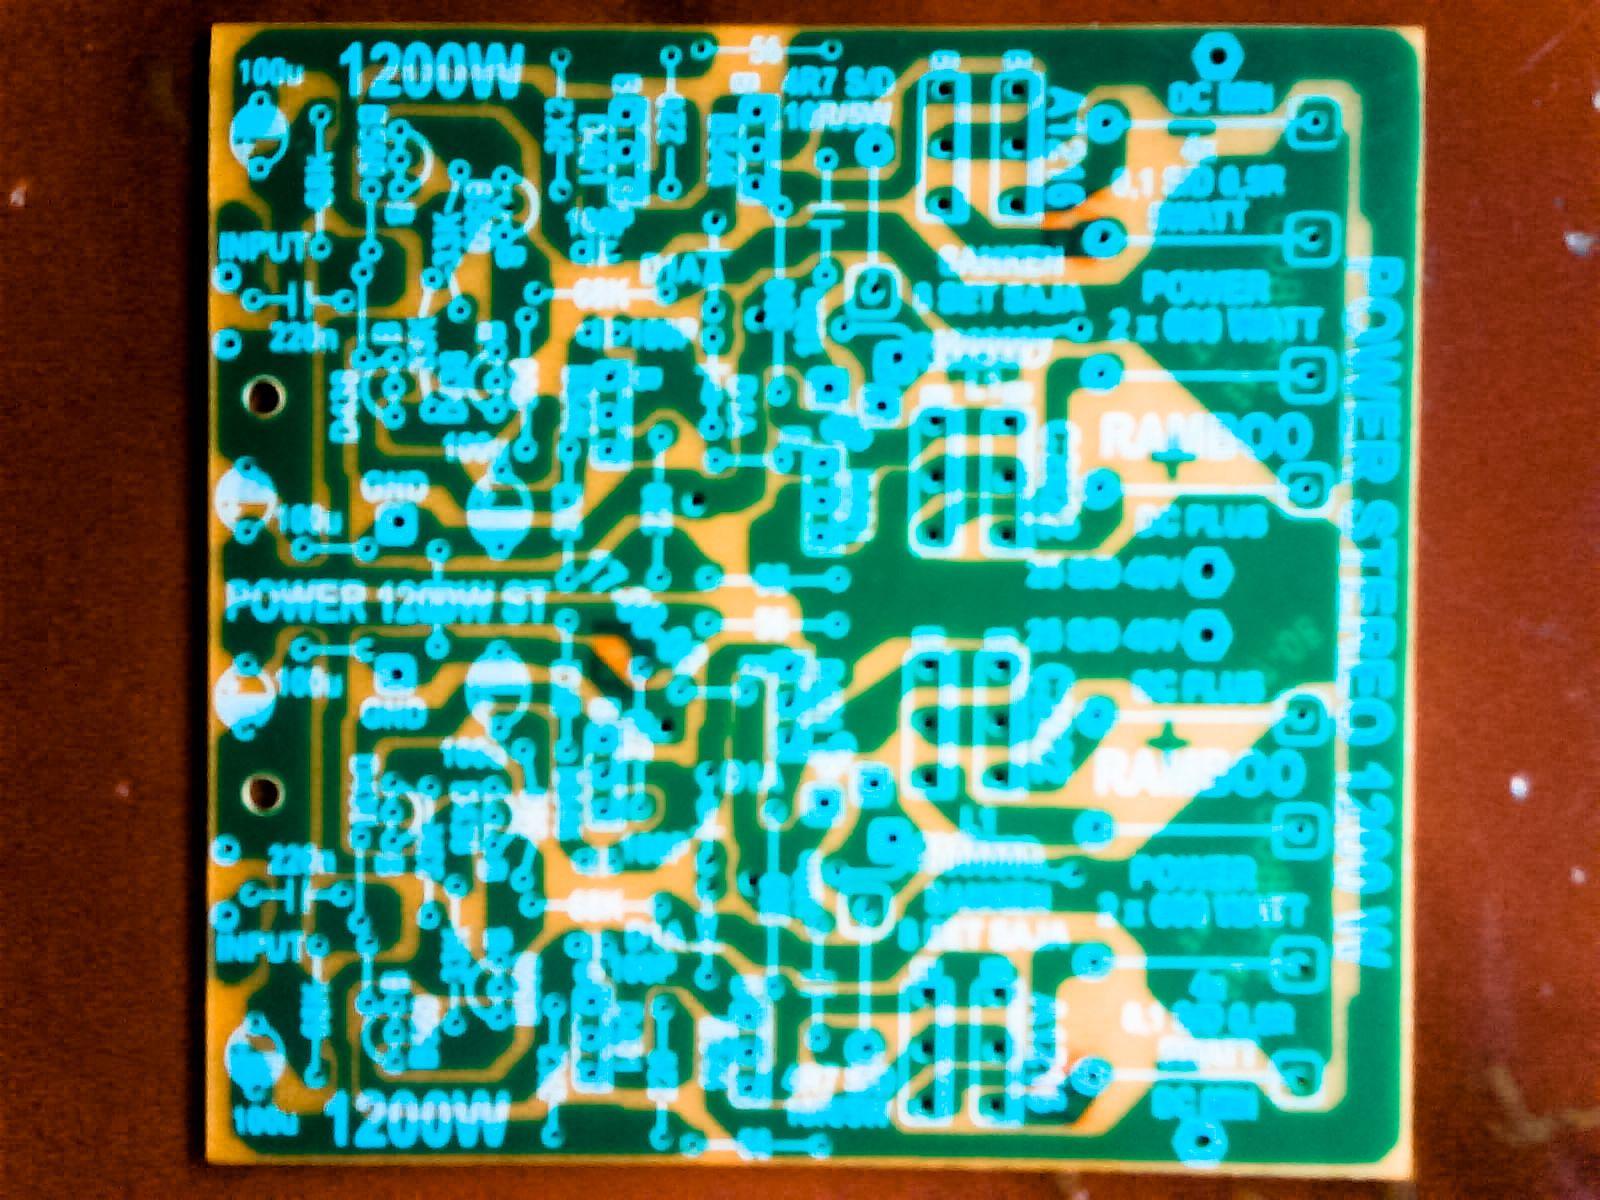 High Power Amplifier - Amp Circuit Diagram | AMPLIFIER | Pinterest ...